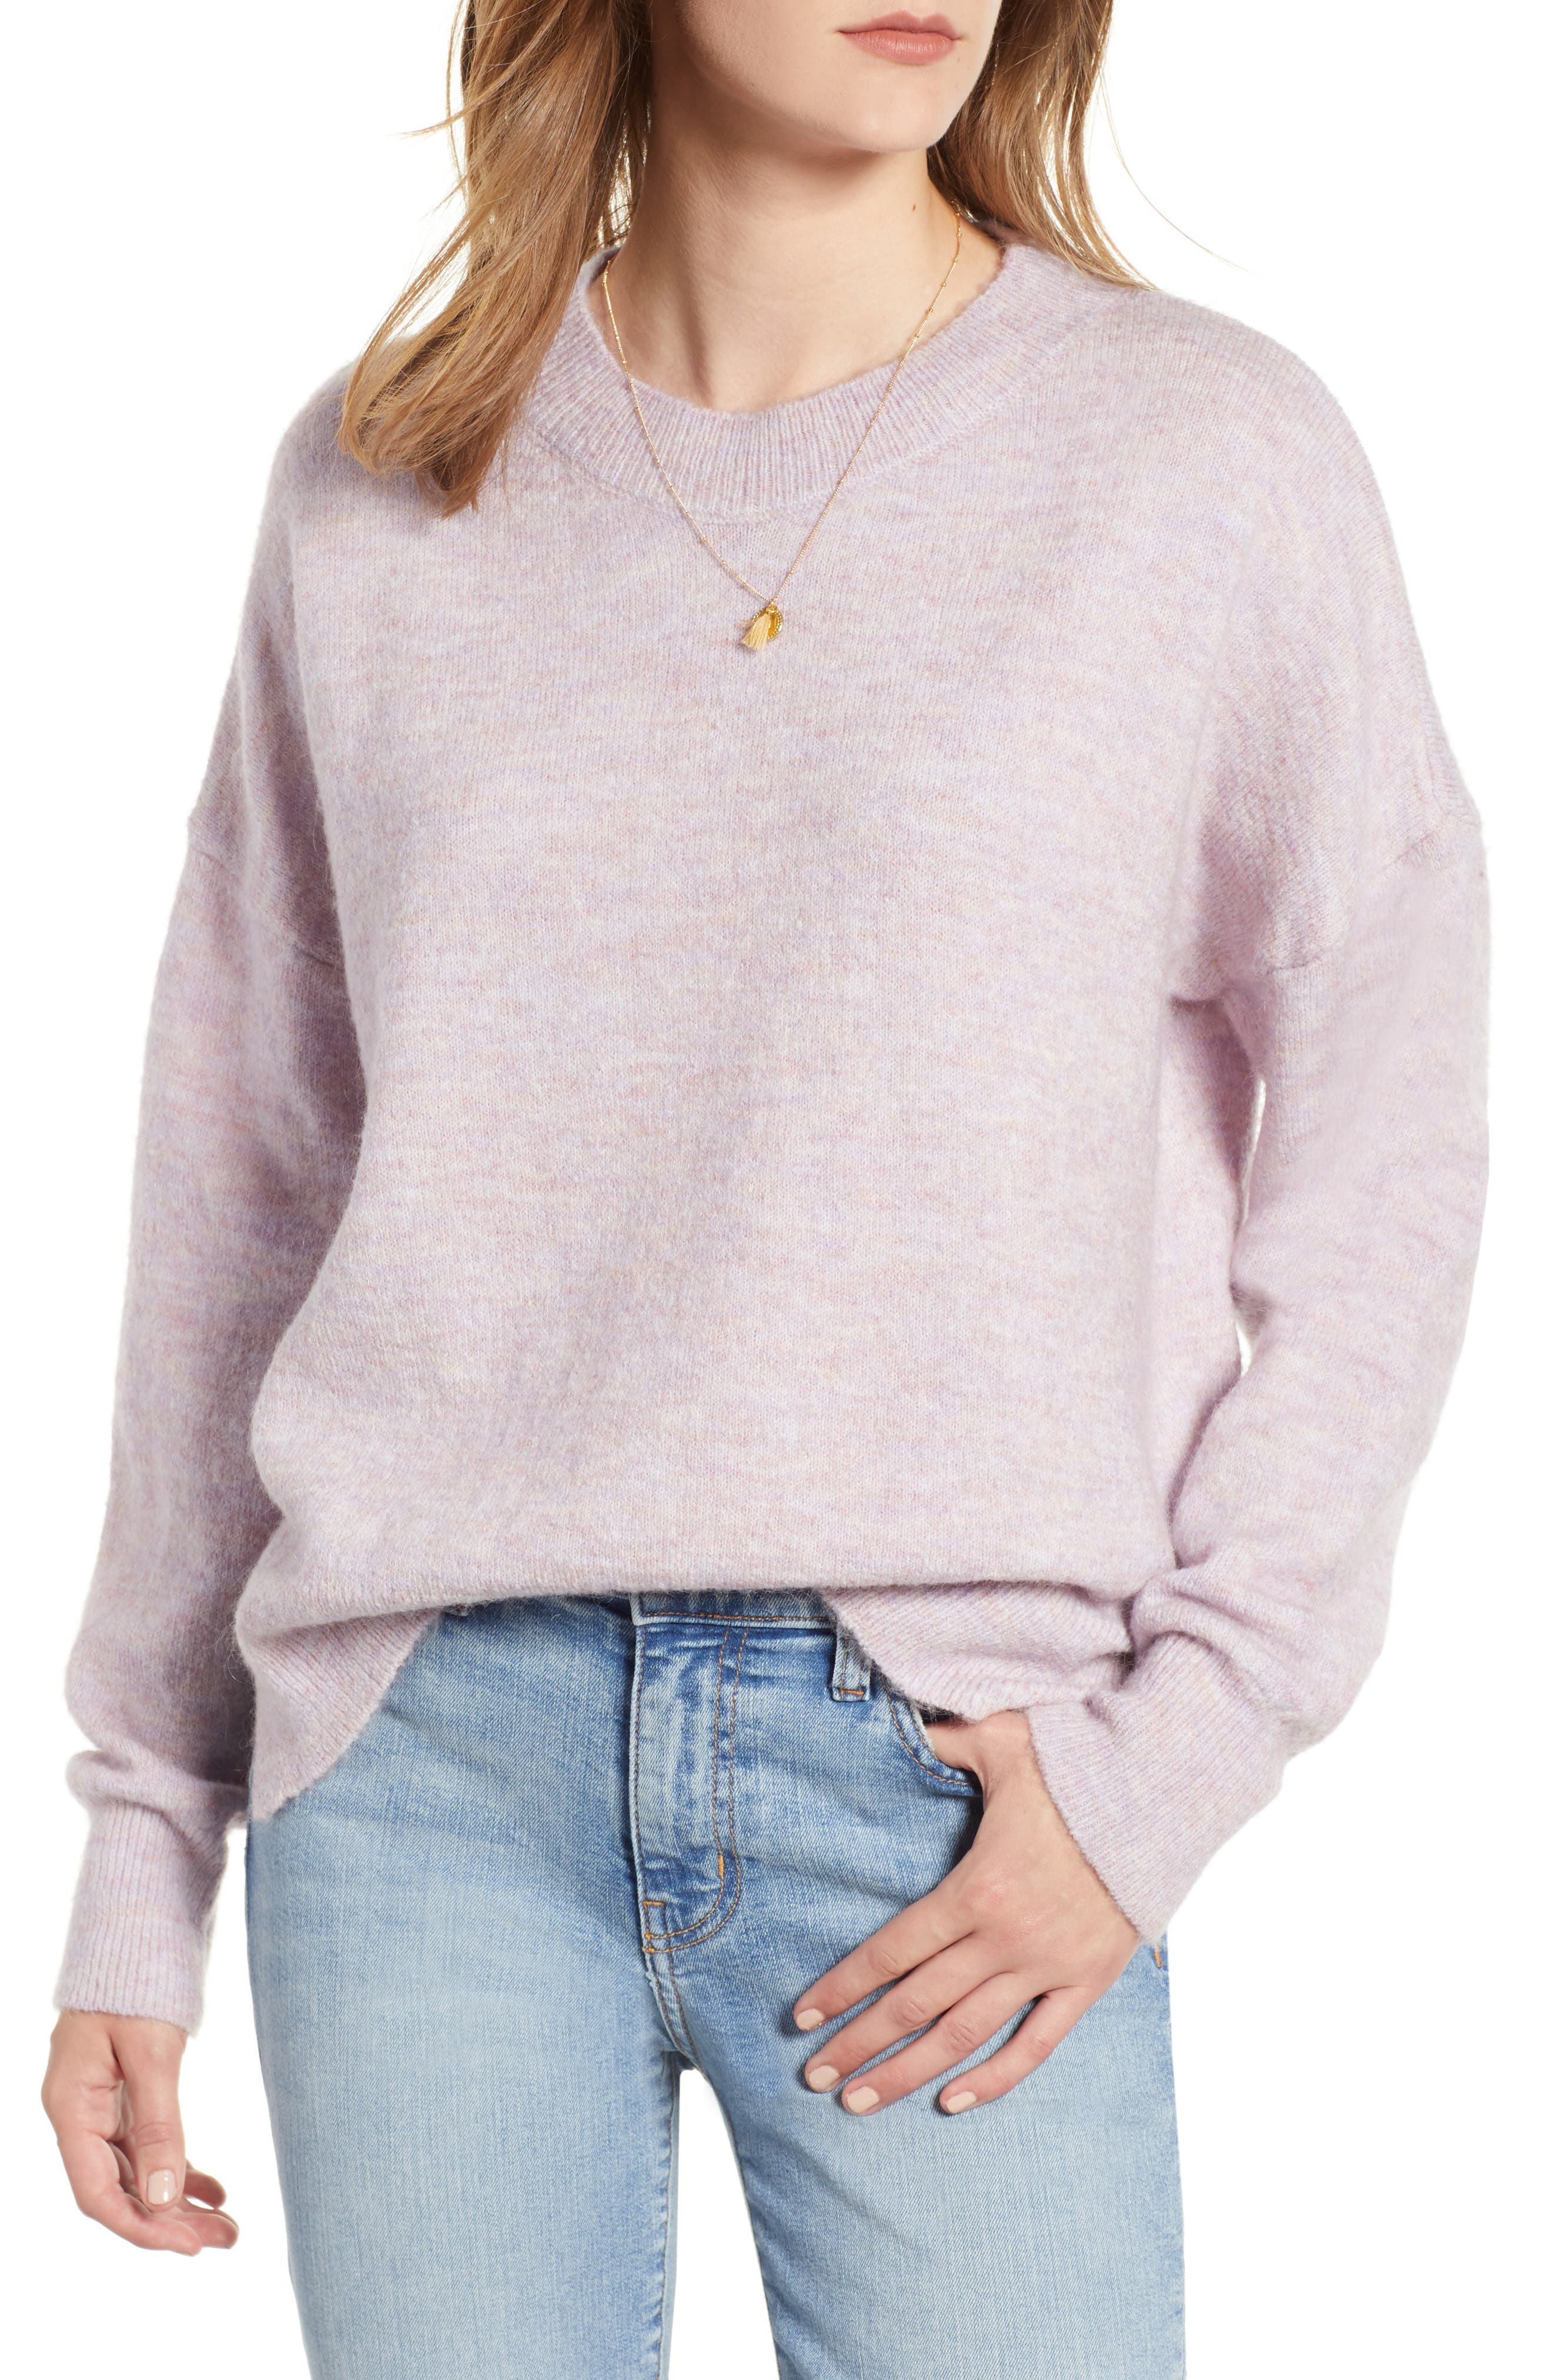 Crewneck Sweater,                             Main thumbnail 1, color,                             LILAC MELANGE